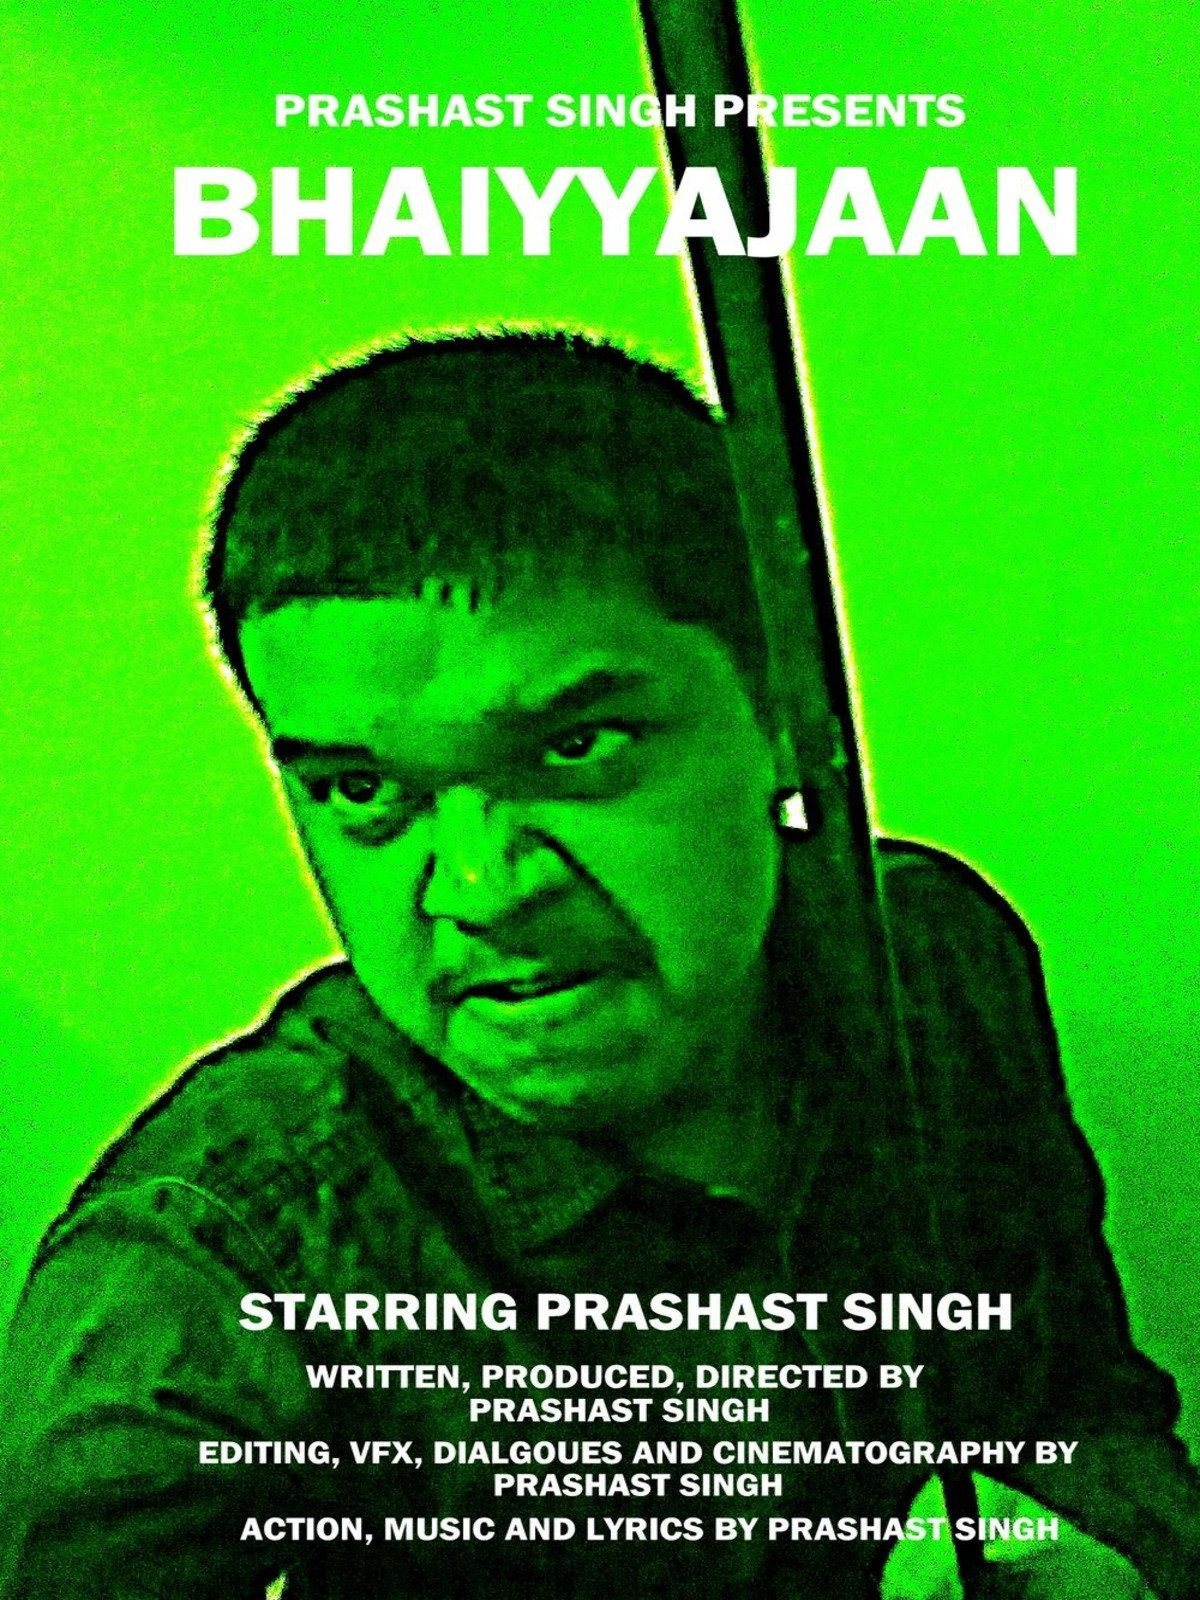 Bhaiyyajaan